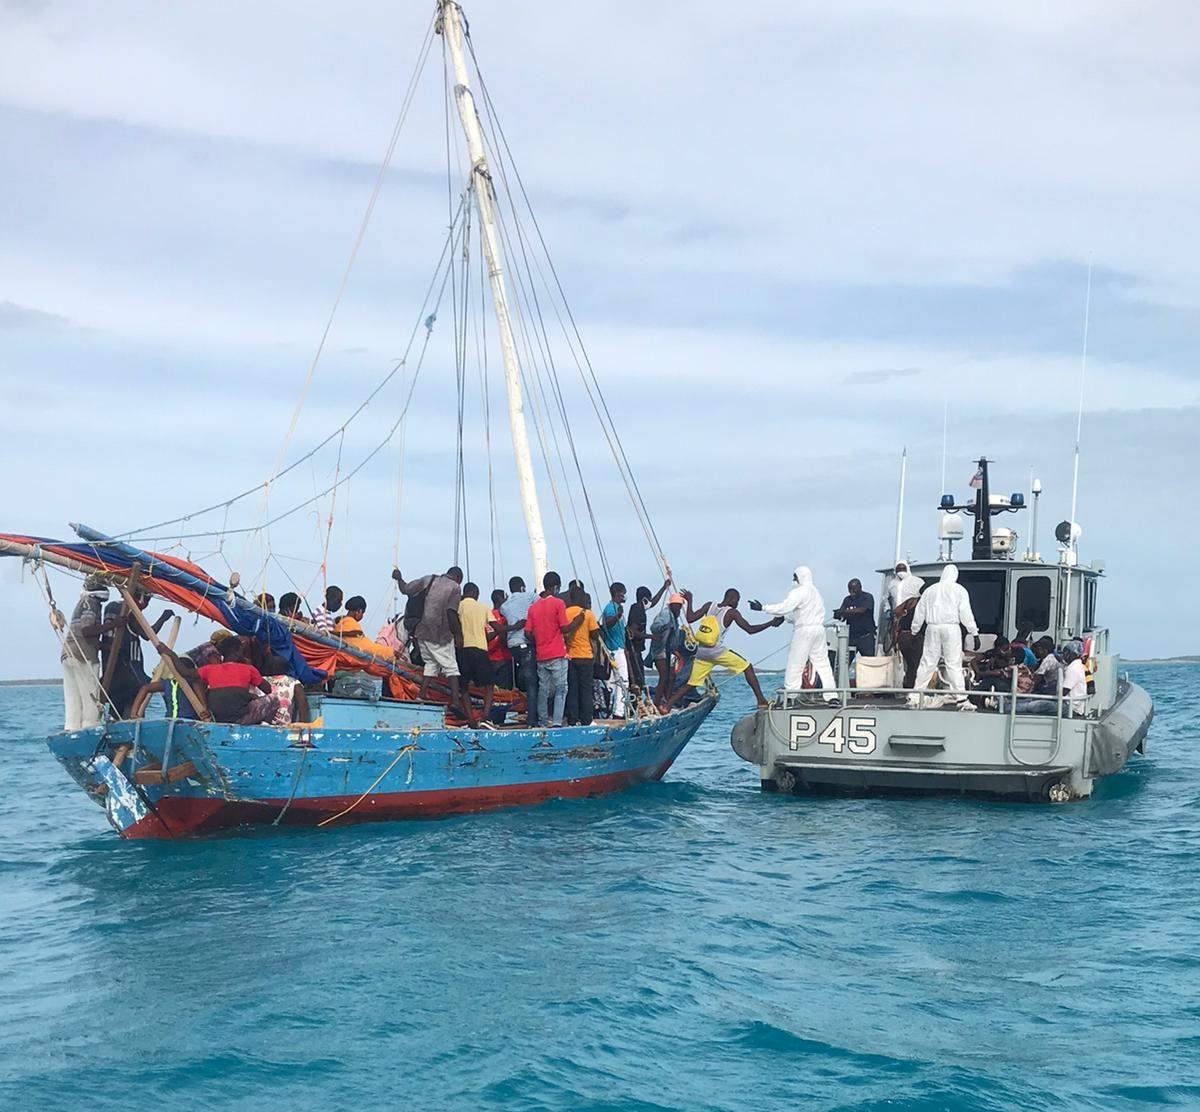 44 Haitian migrants apprehended in the Exuma Cays